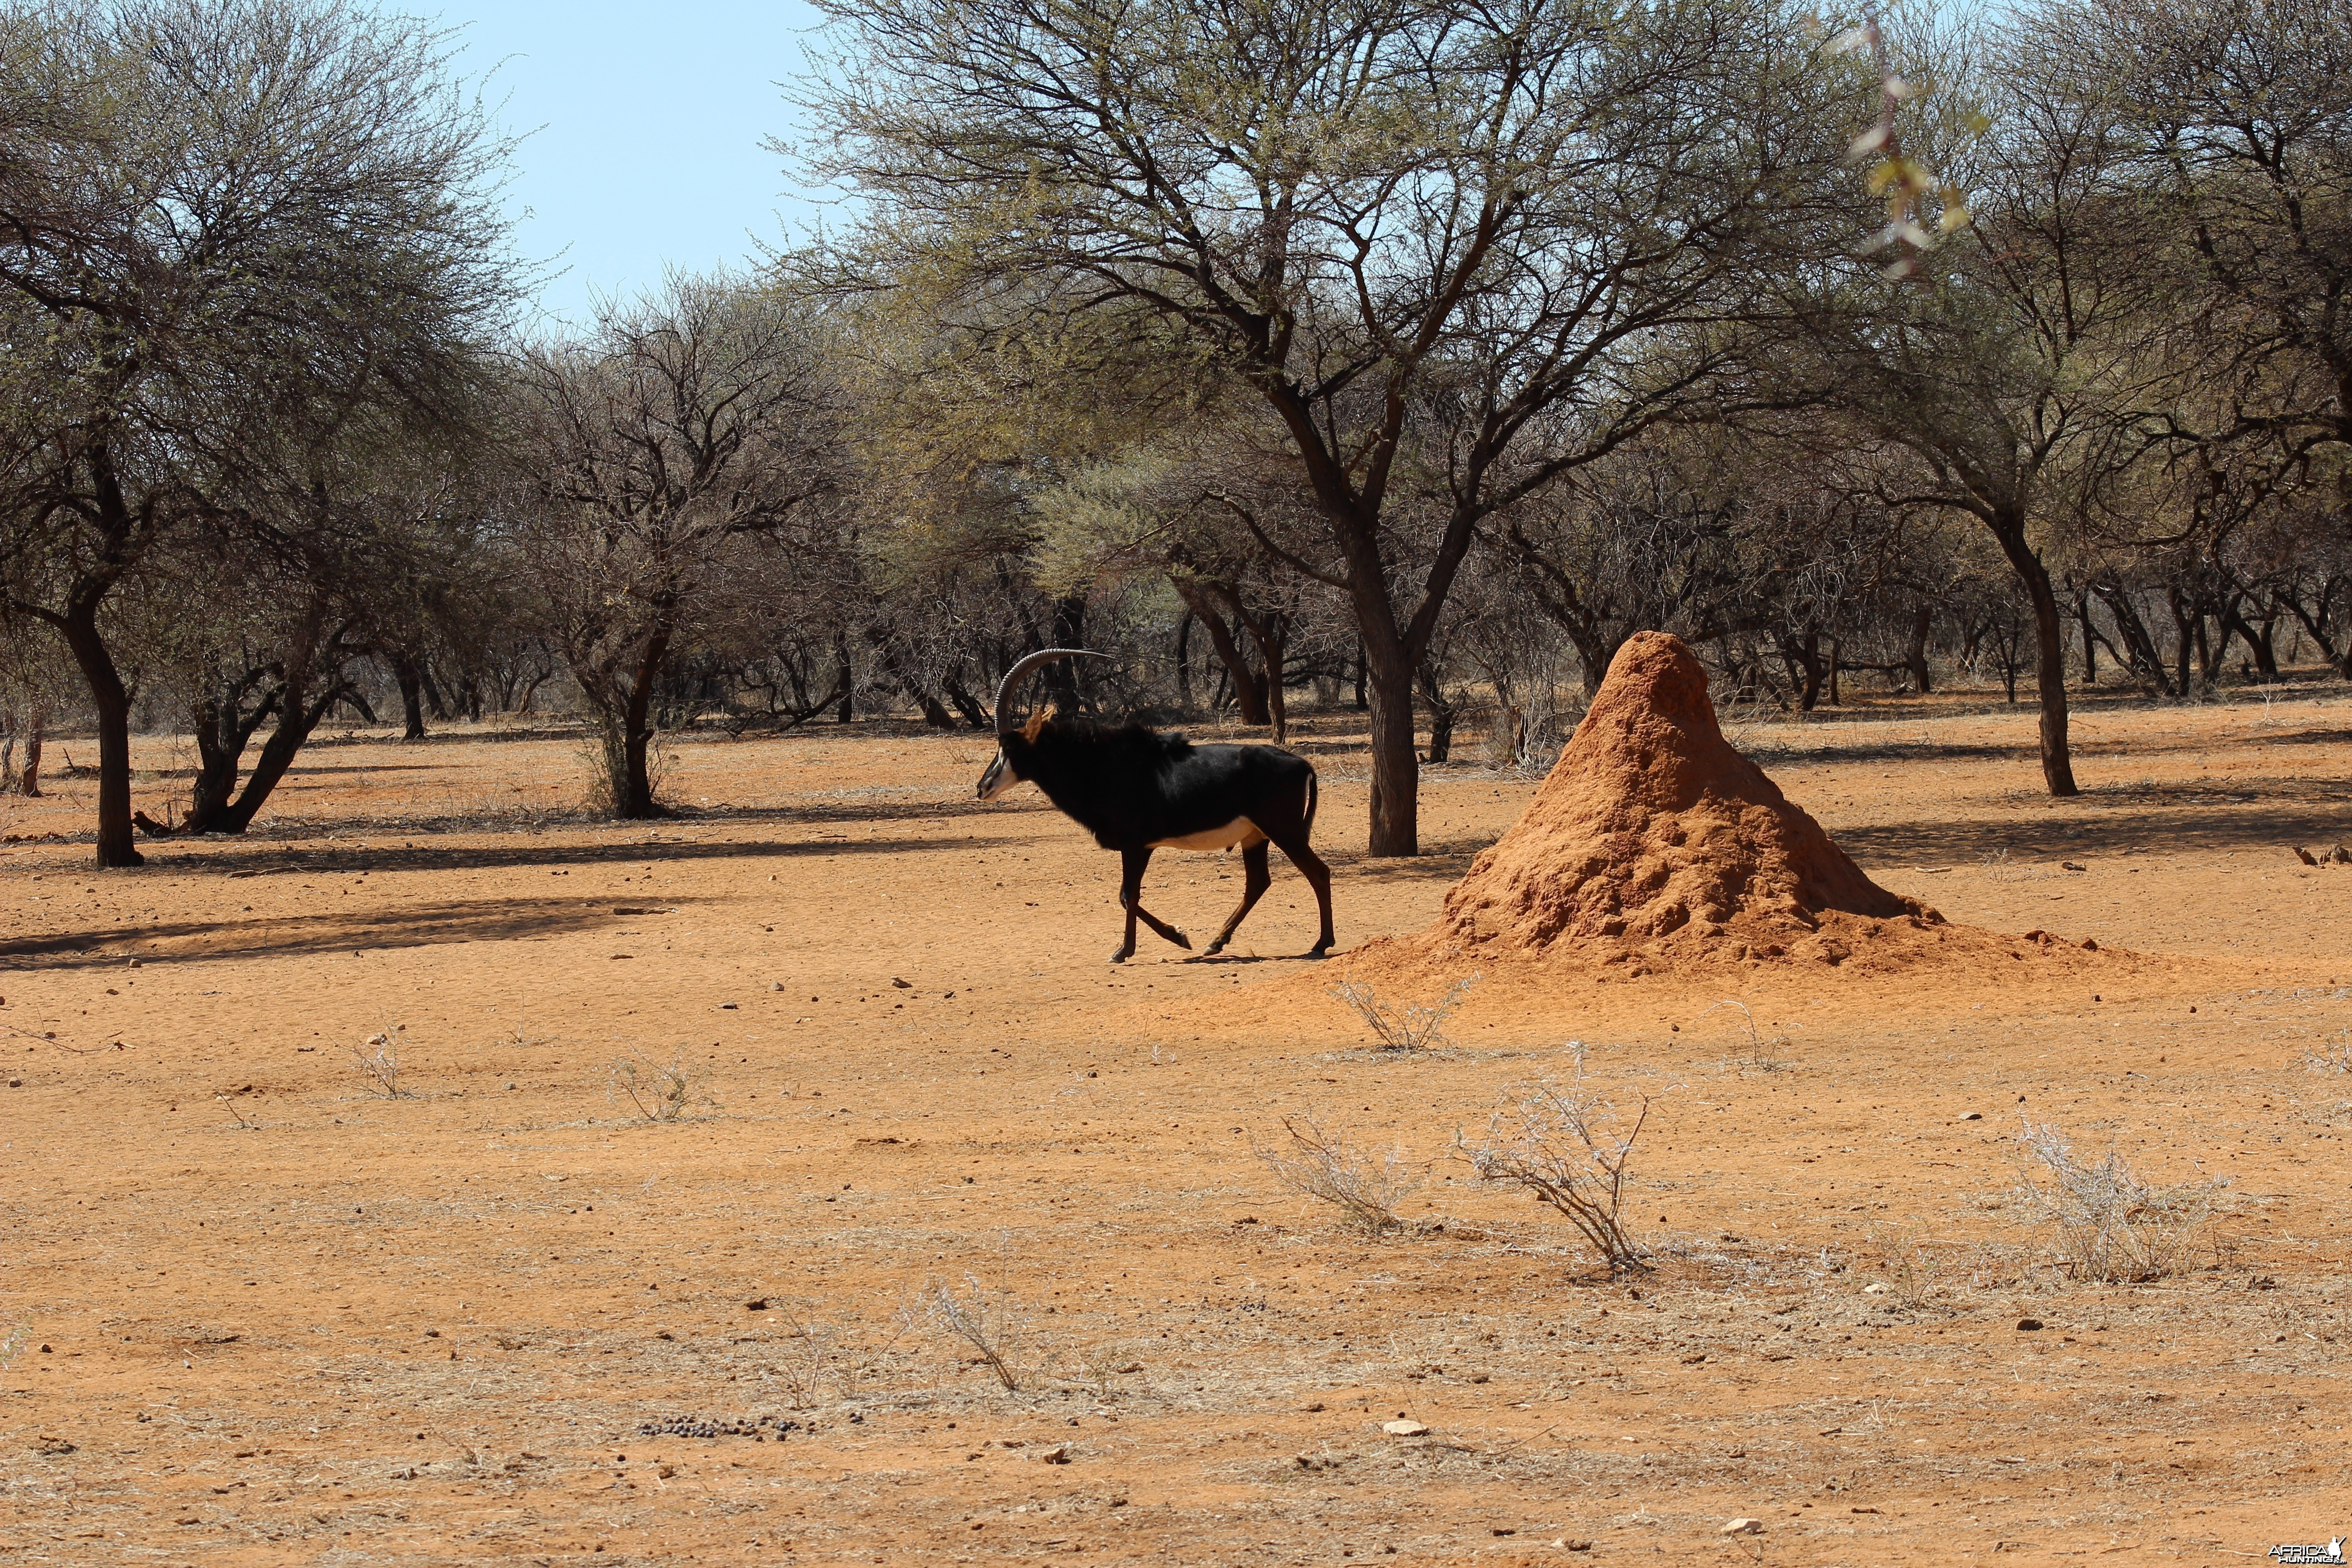 Sable Antelope Namibia